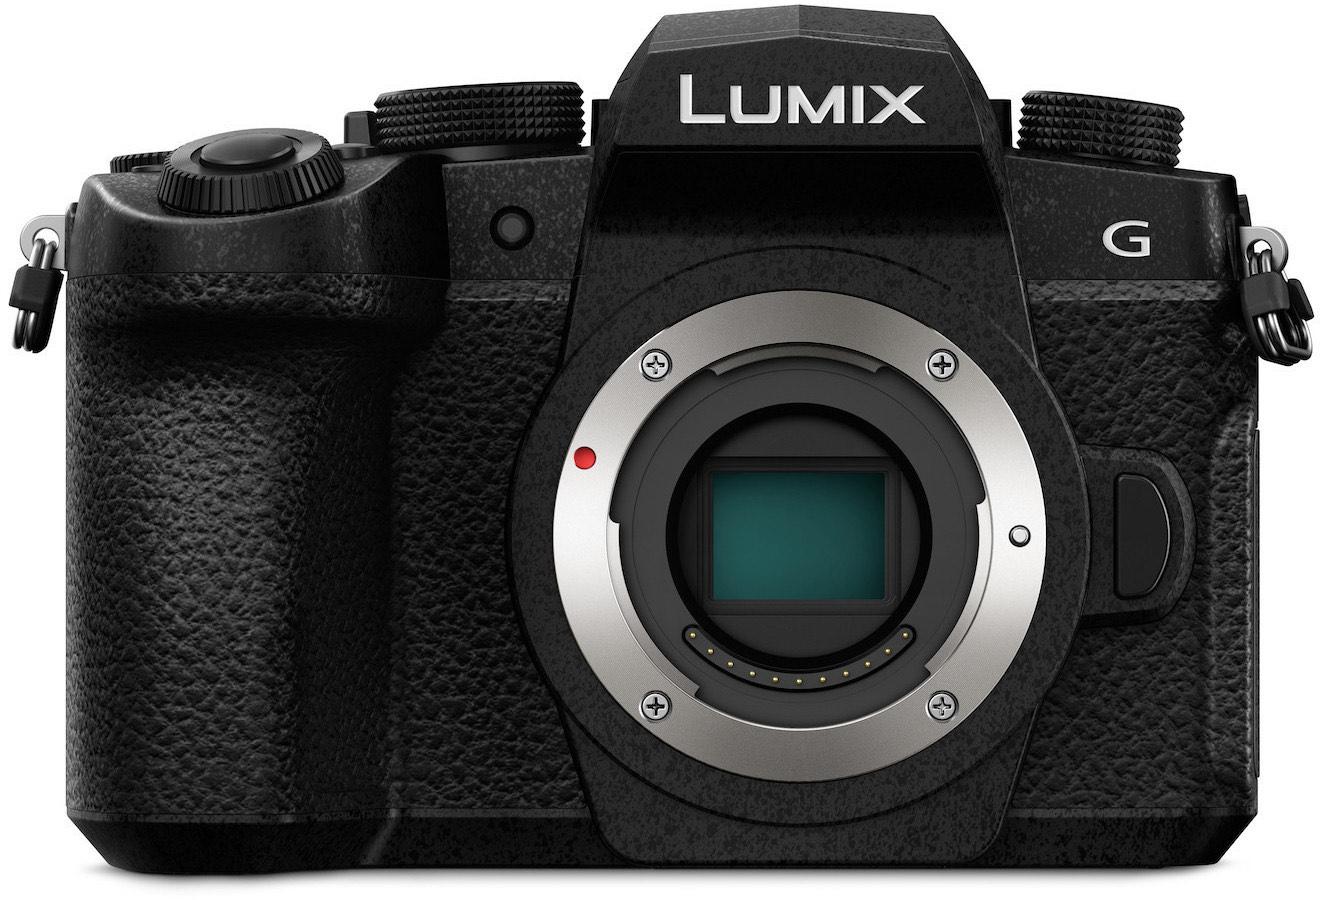 Panasonic Lumix Kamera & Objektiv Sammeldeal - z.B. G90 MFT Systemkamera // Ollo Store